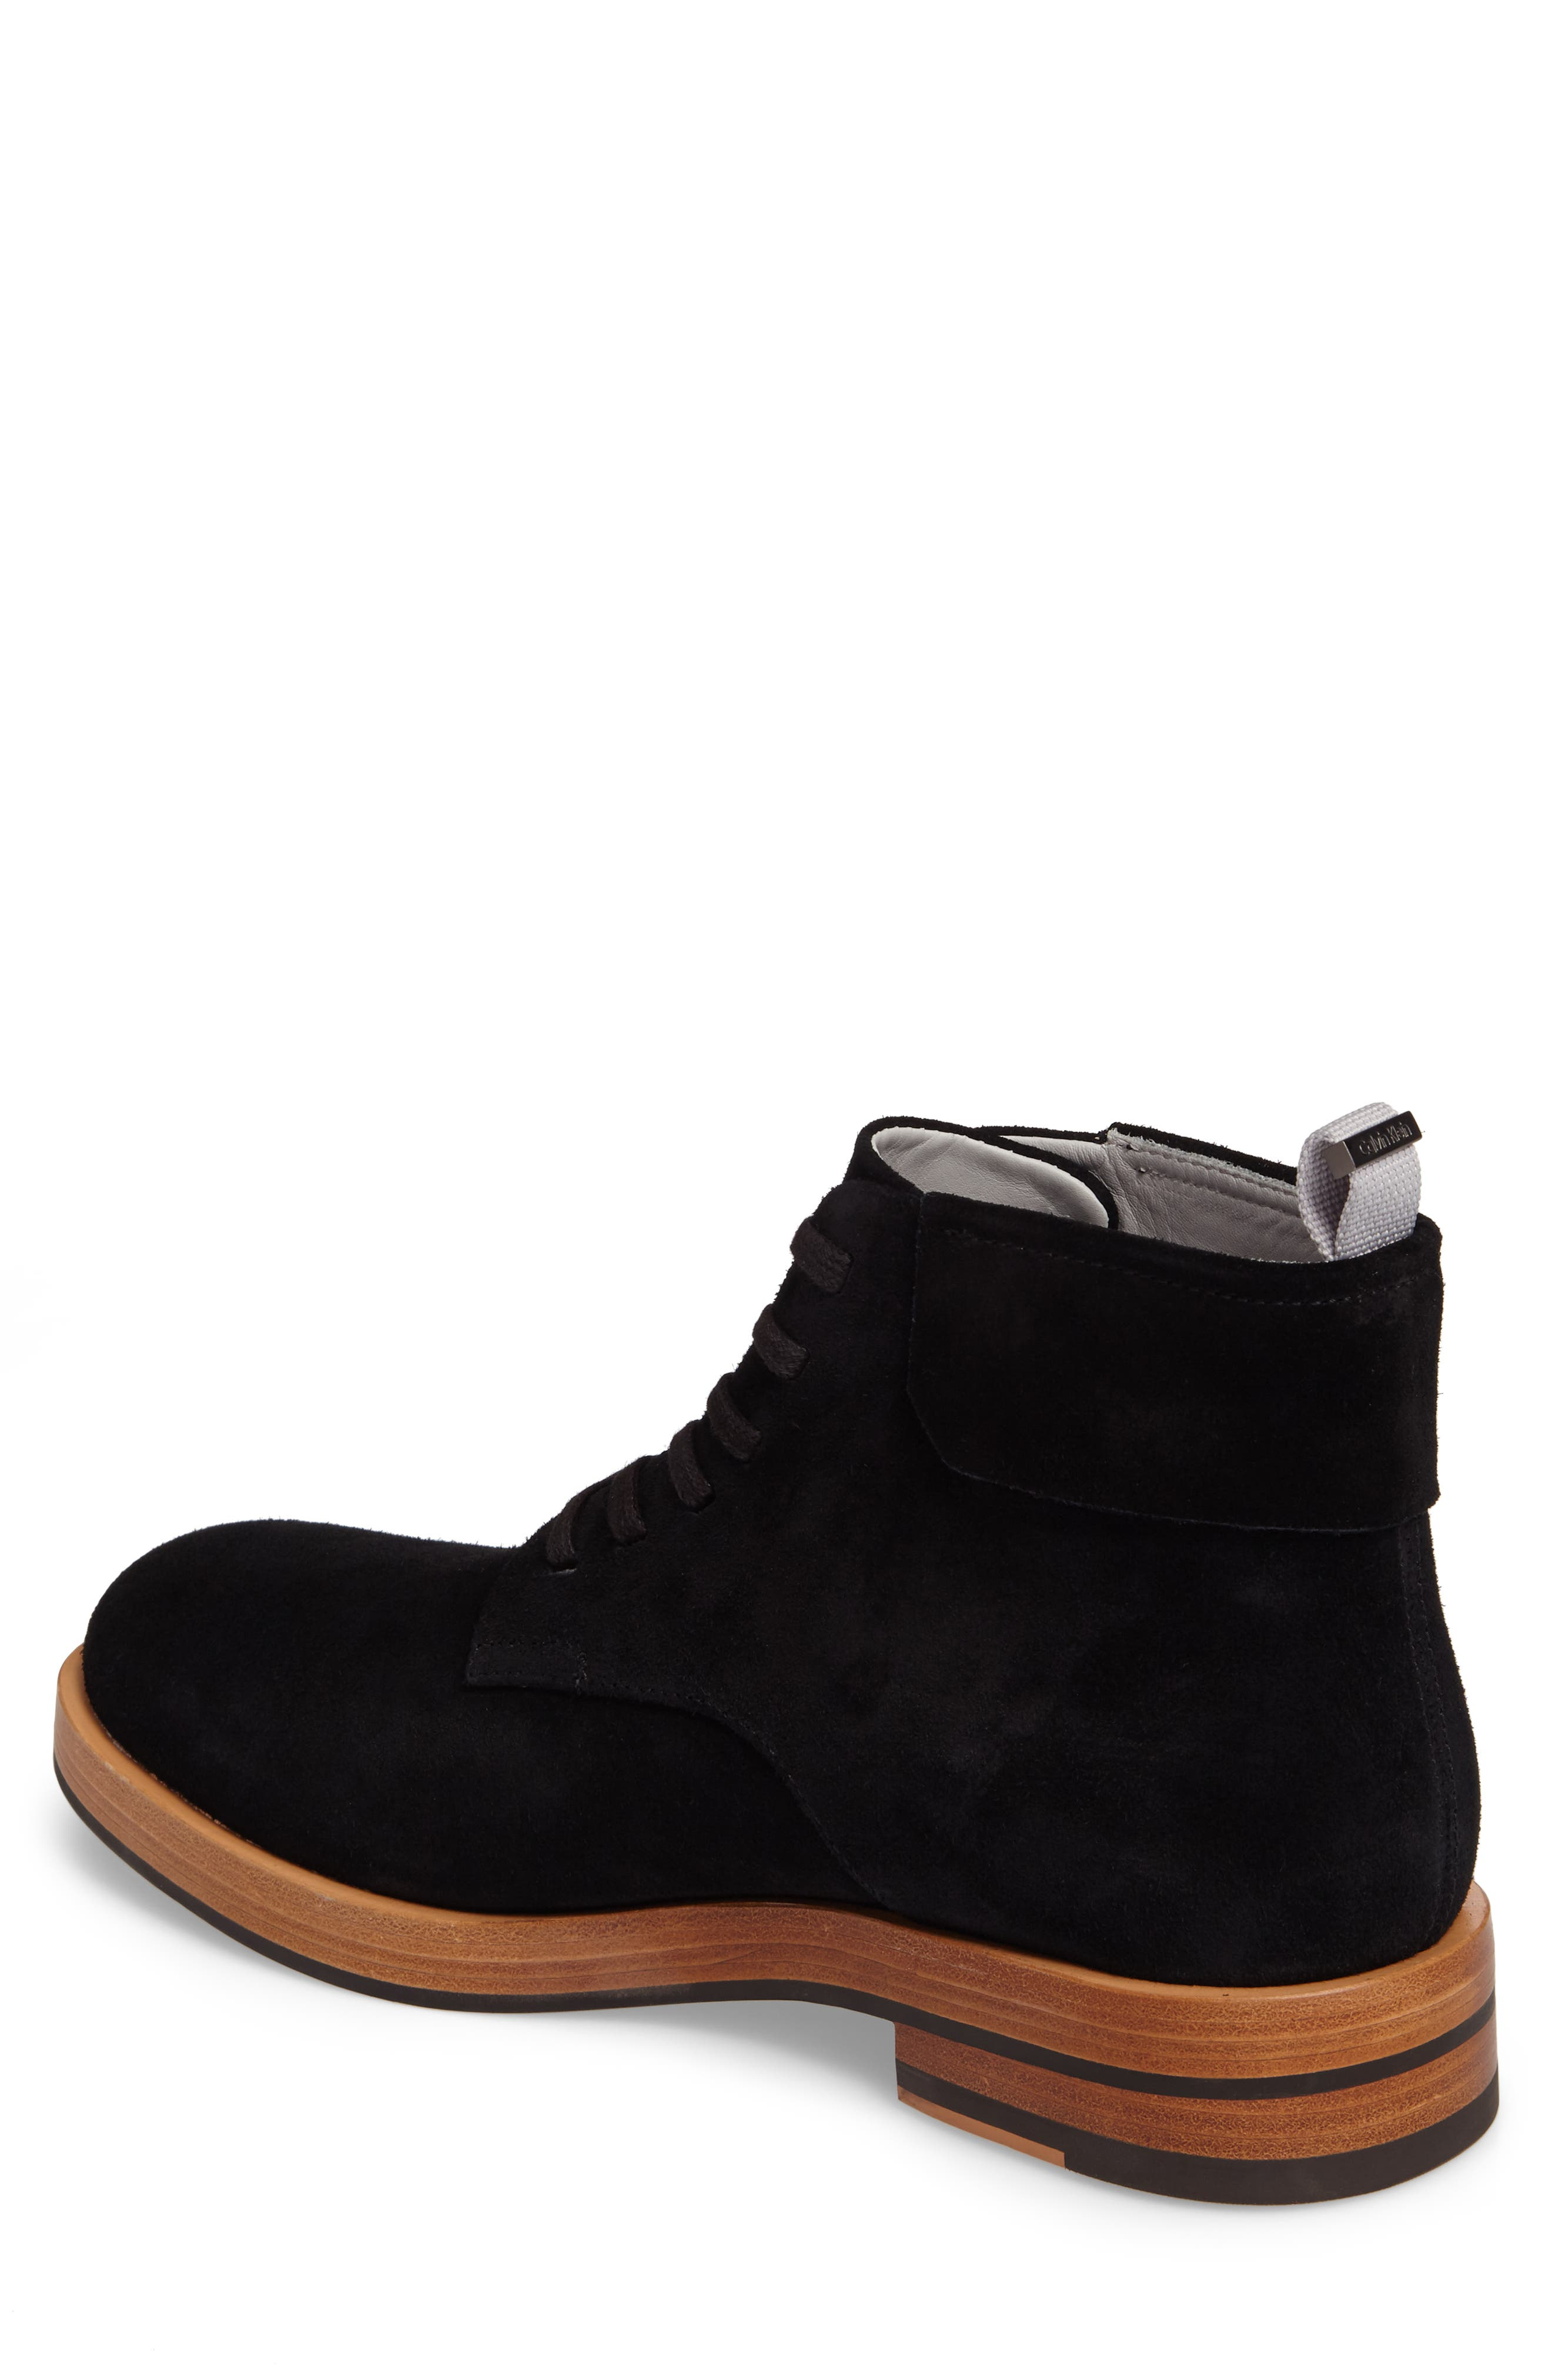 Radburn Plain Toe Boot,                             Alternate thumbnail 2, color,                             001